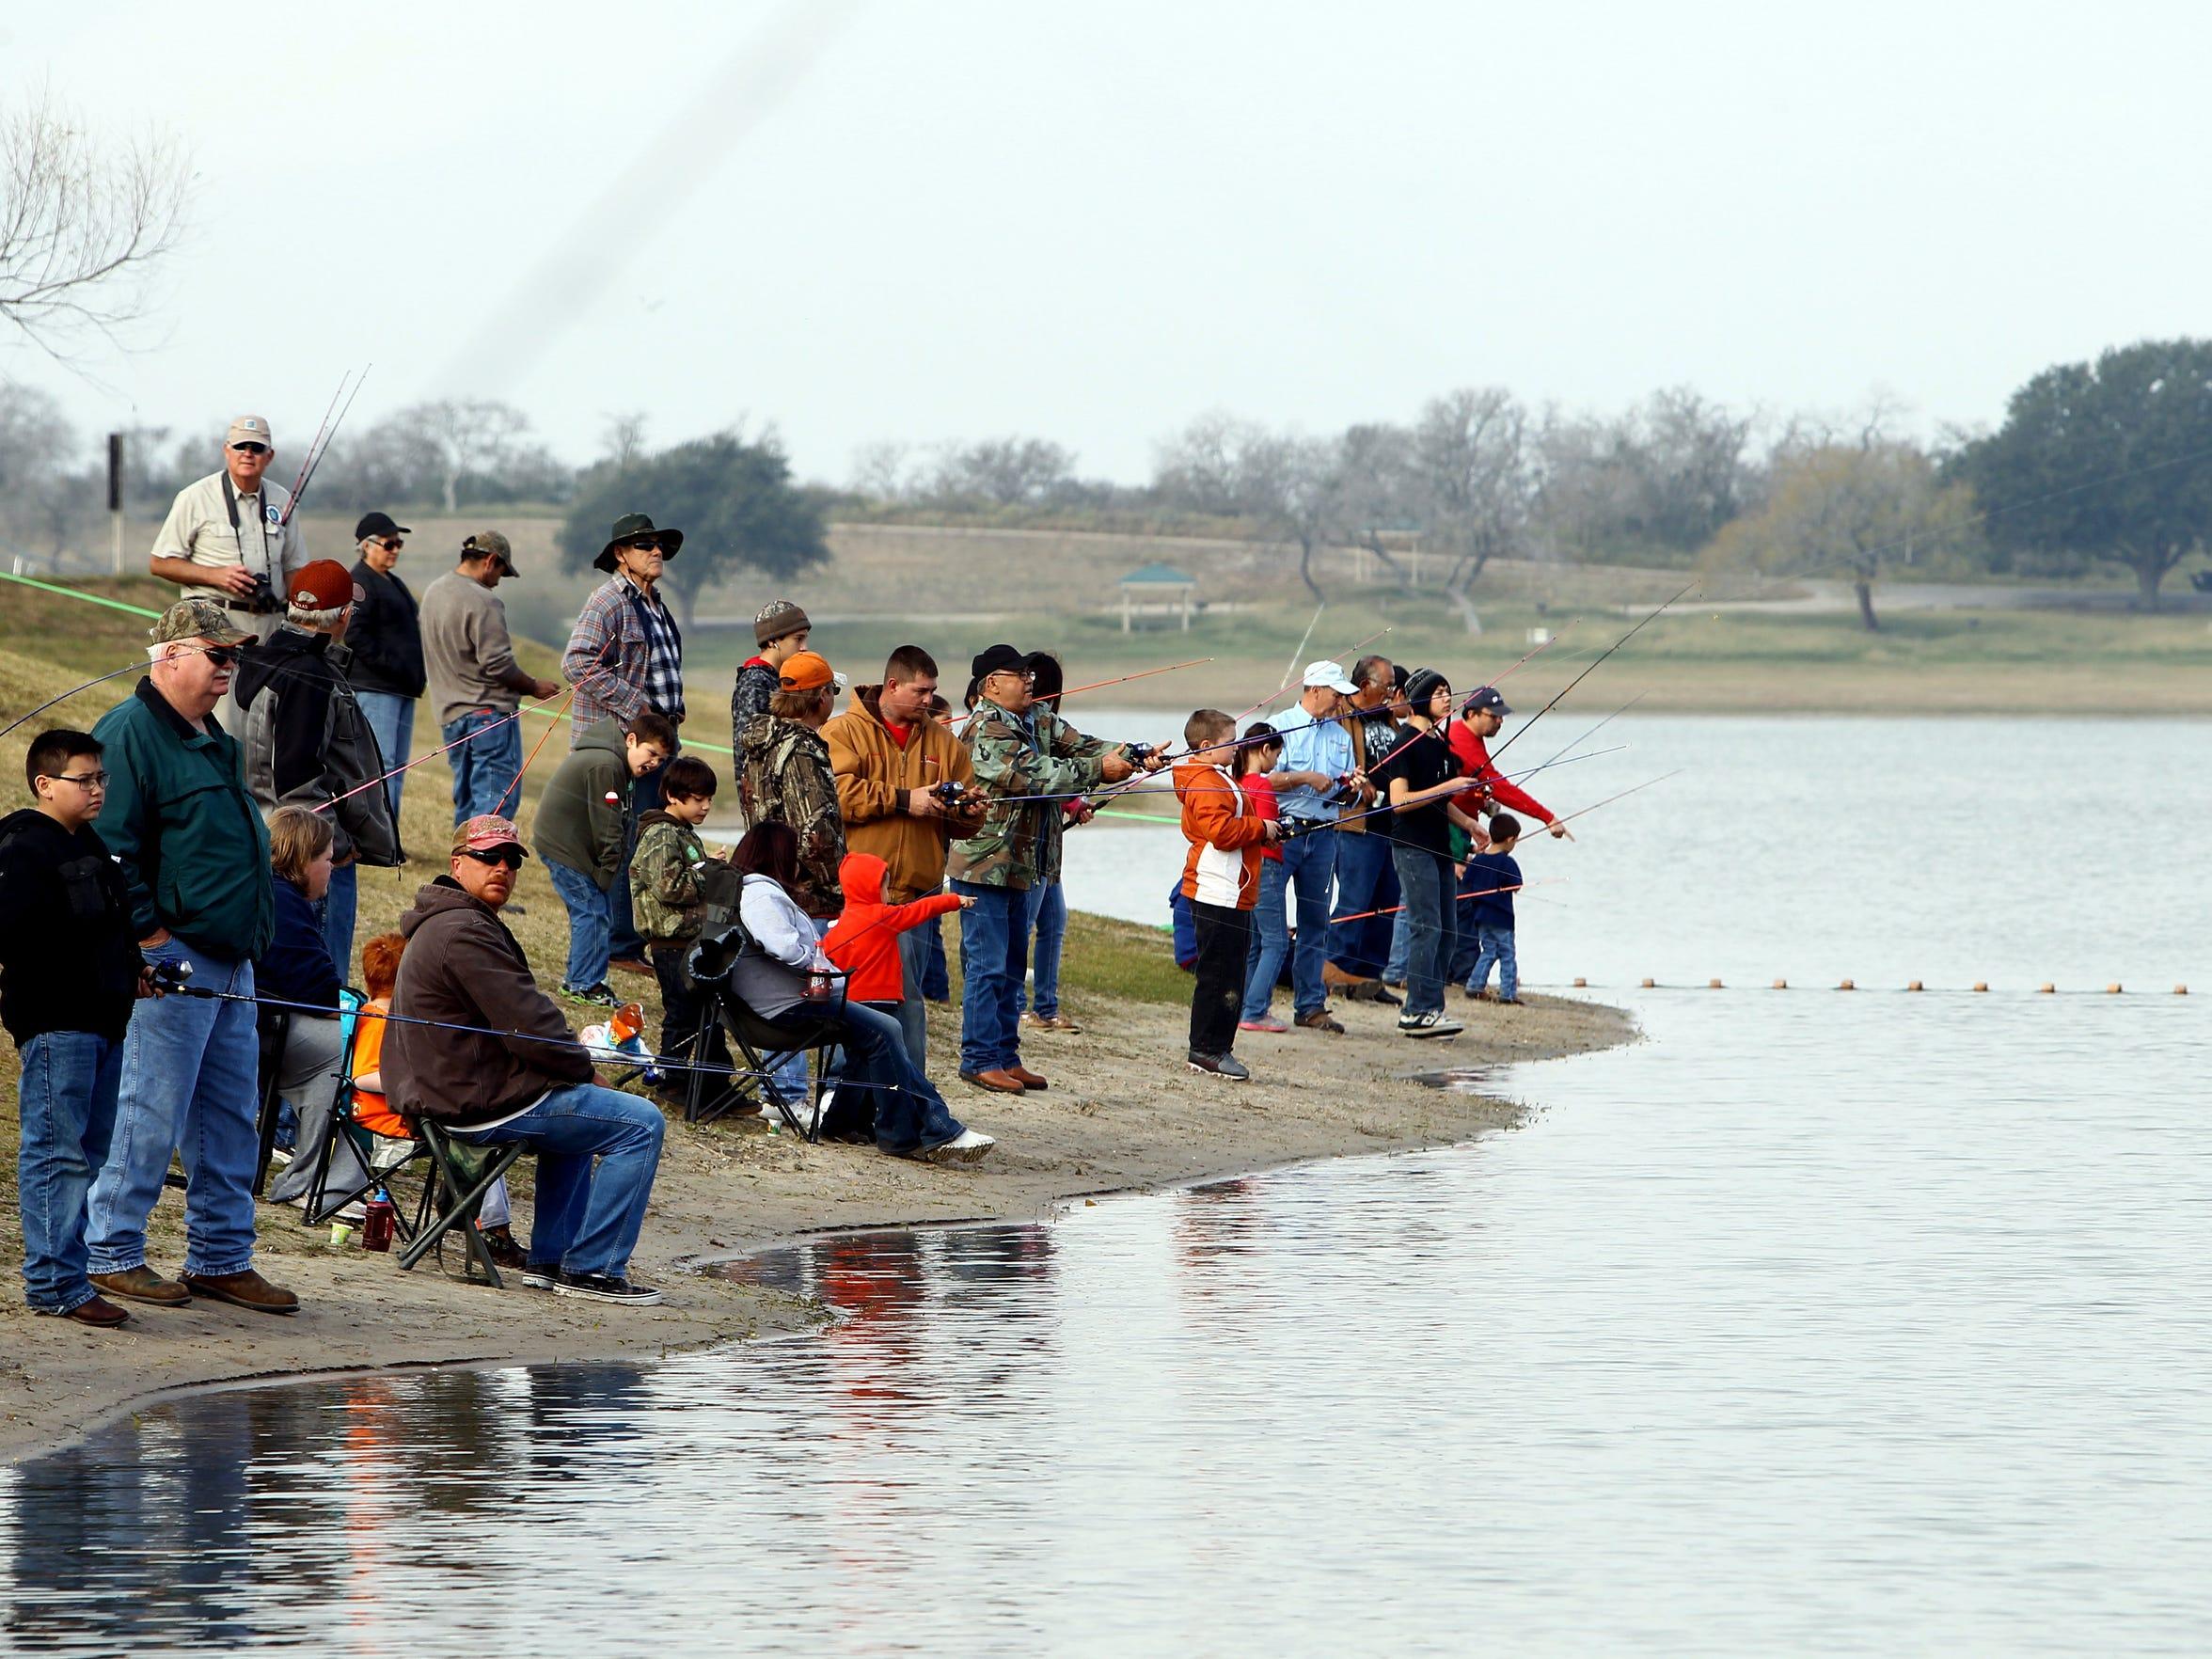 Lake Corpus Christi State Park organizes an annual kid fish event each winter at the lake.